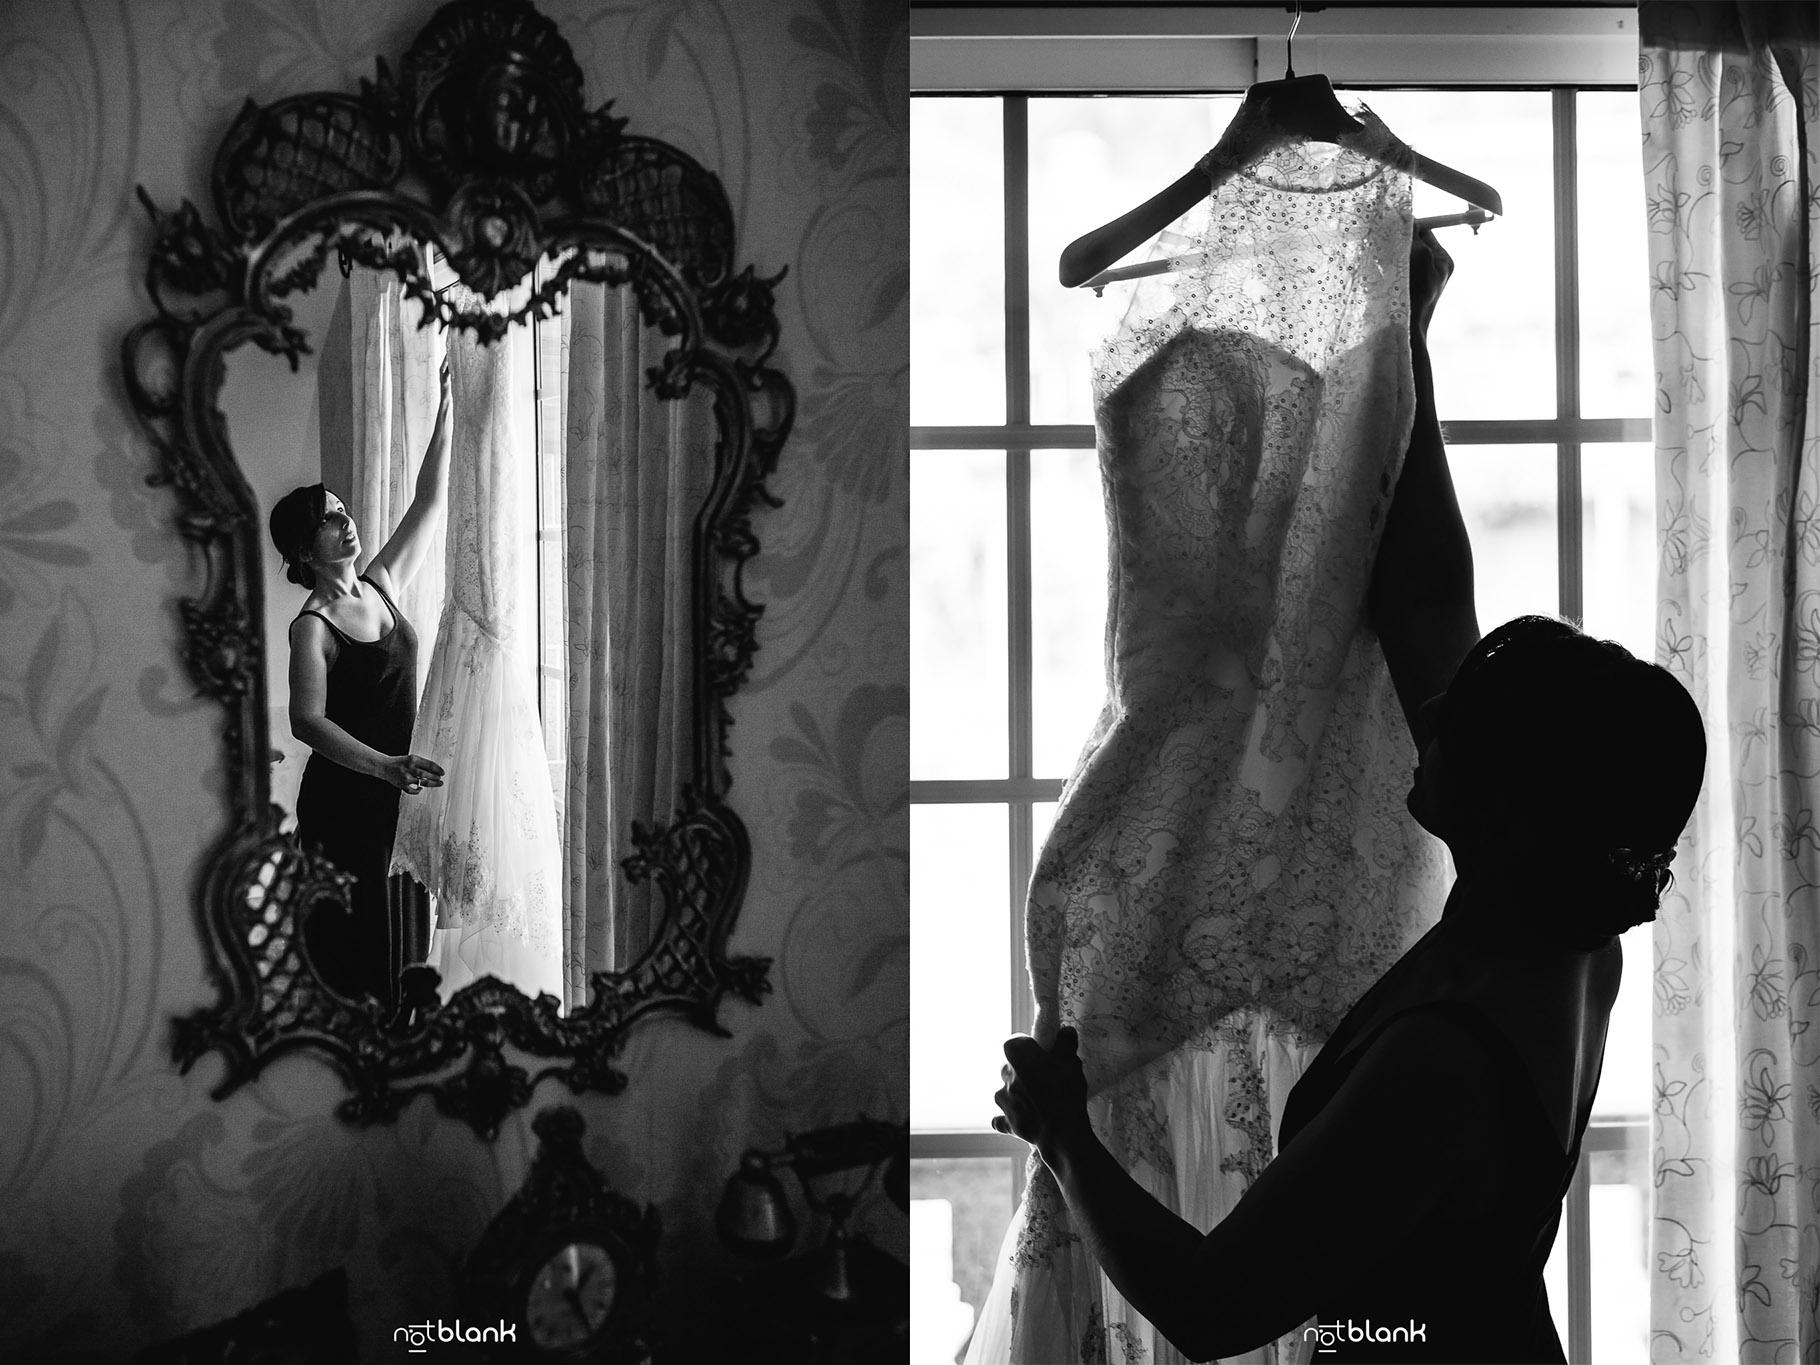 Boda-Maite-David-Preparativos-Novia-En-Casa-Cogiendo-Vestido-Novia. reportaje realizado por Notblank fotografos de boda.